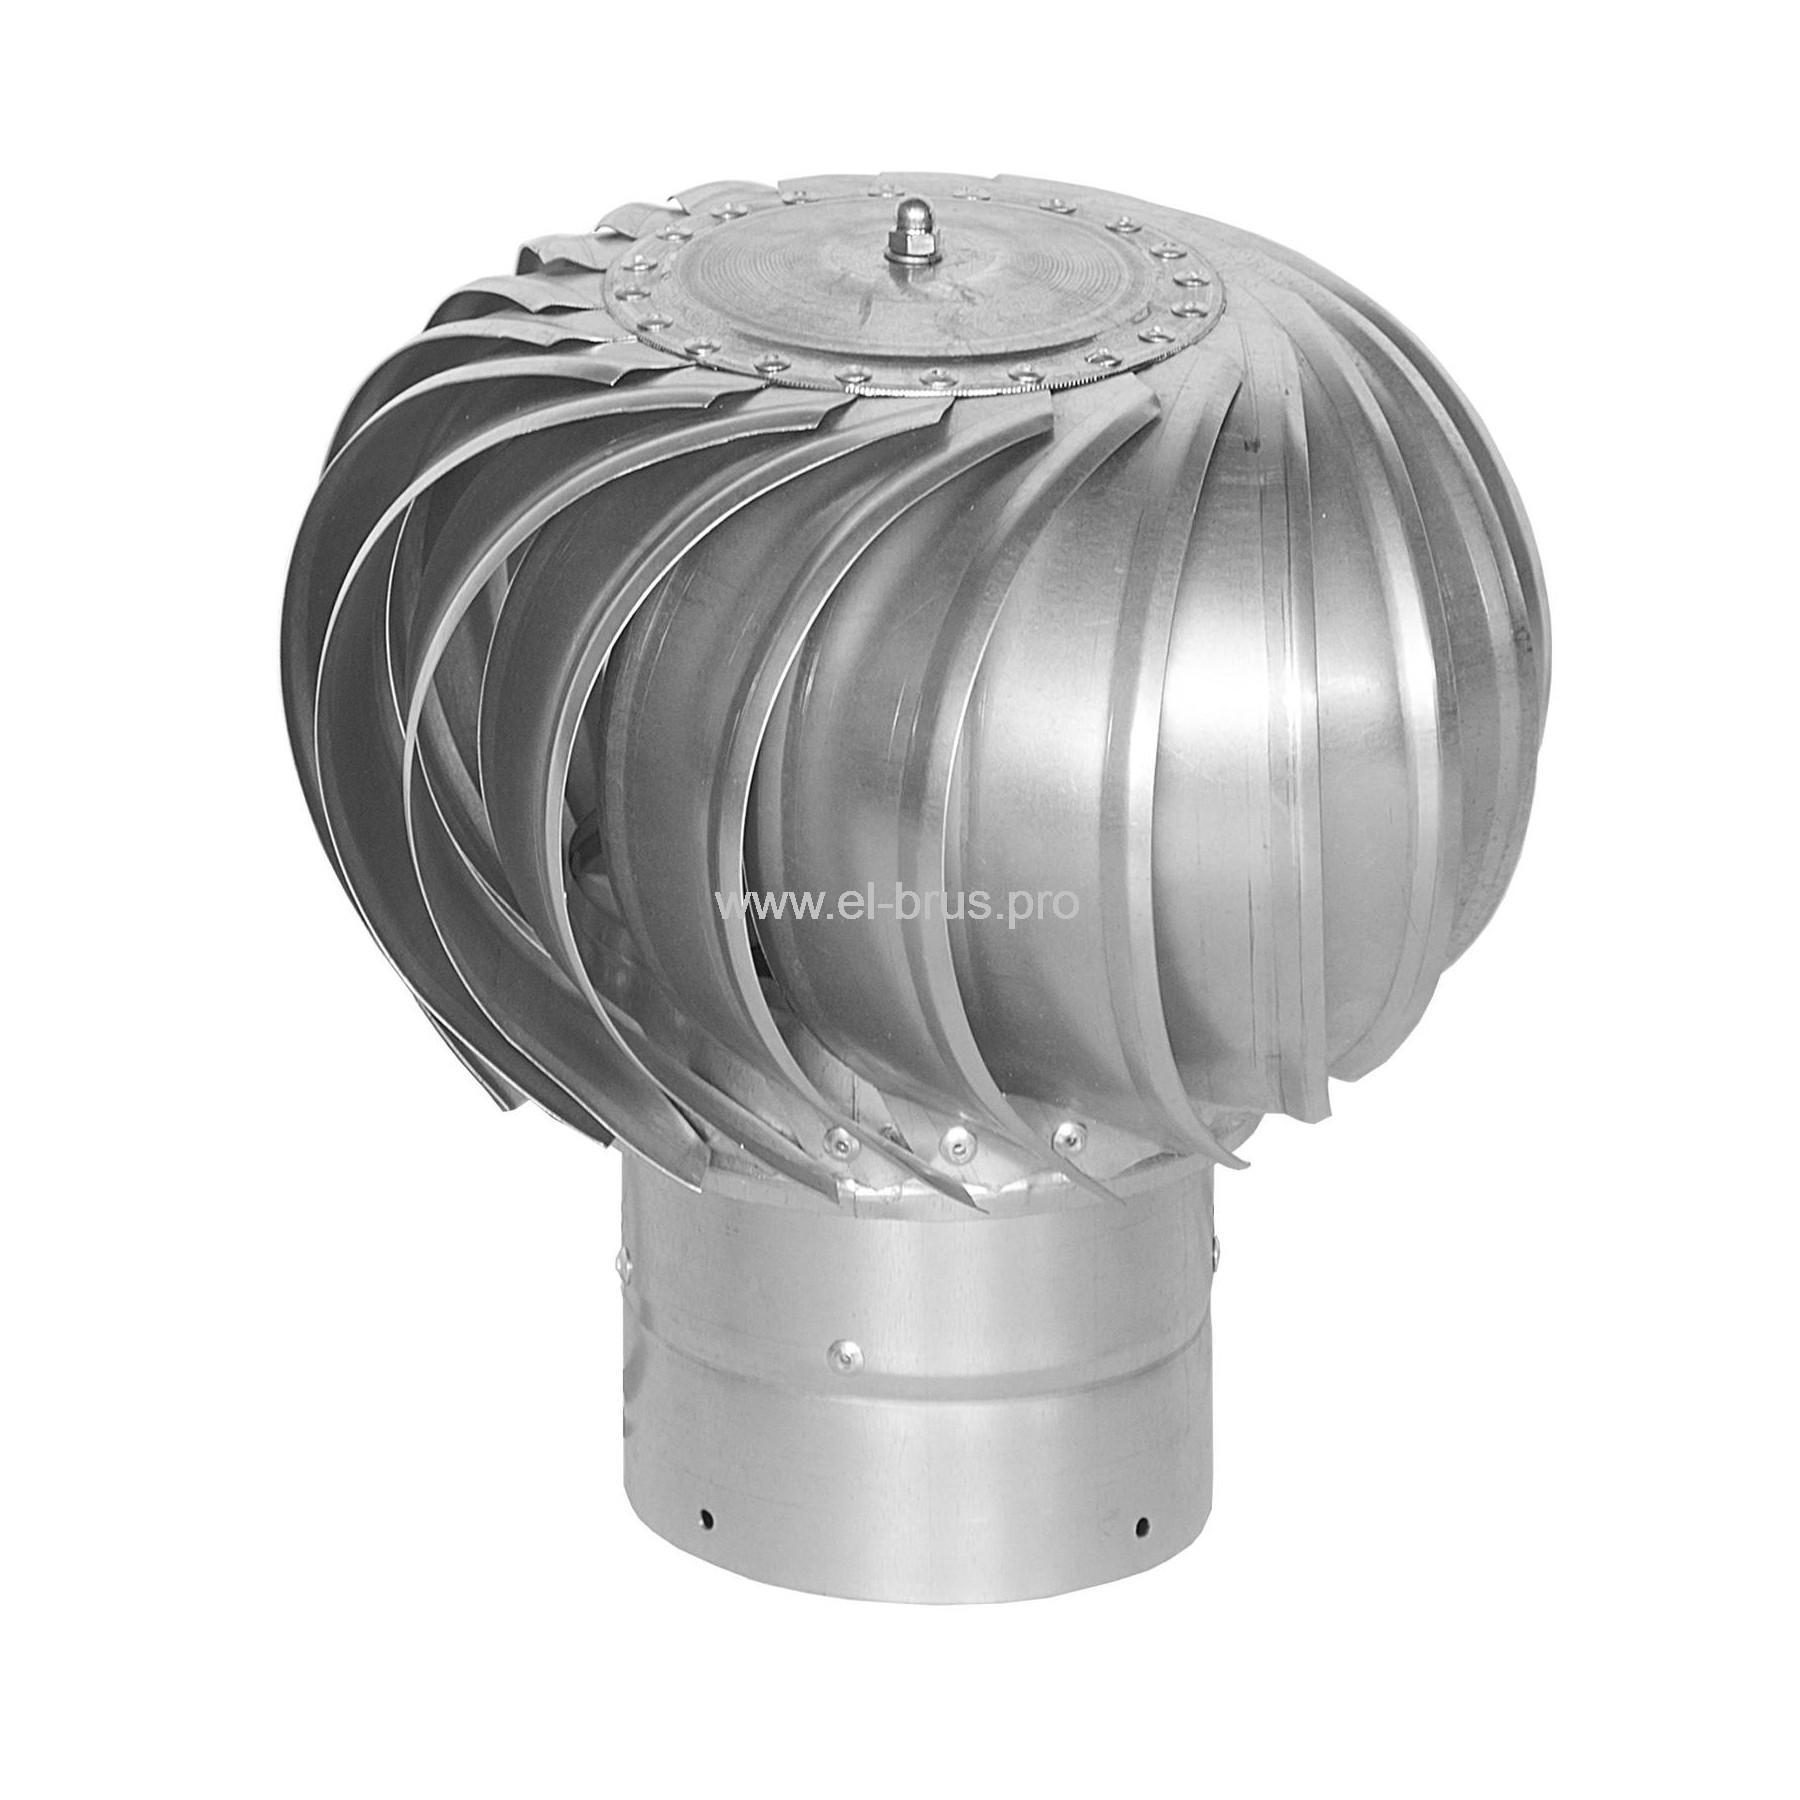 Турбодефлектор оцинк. металл Ø125мм